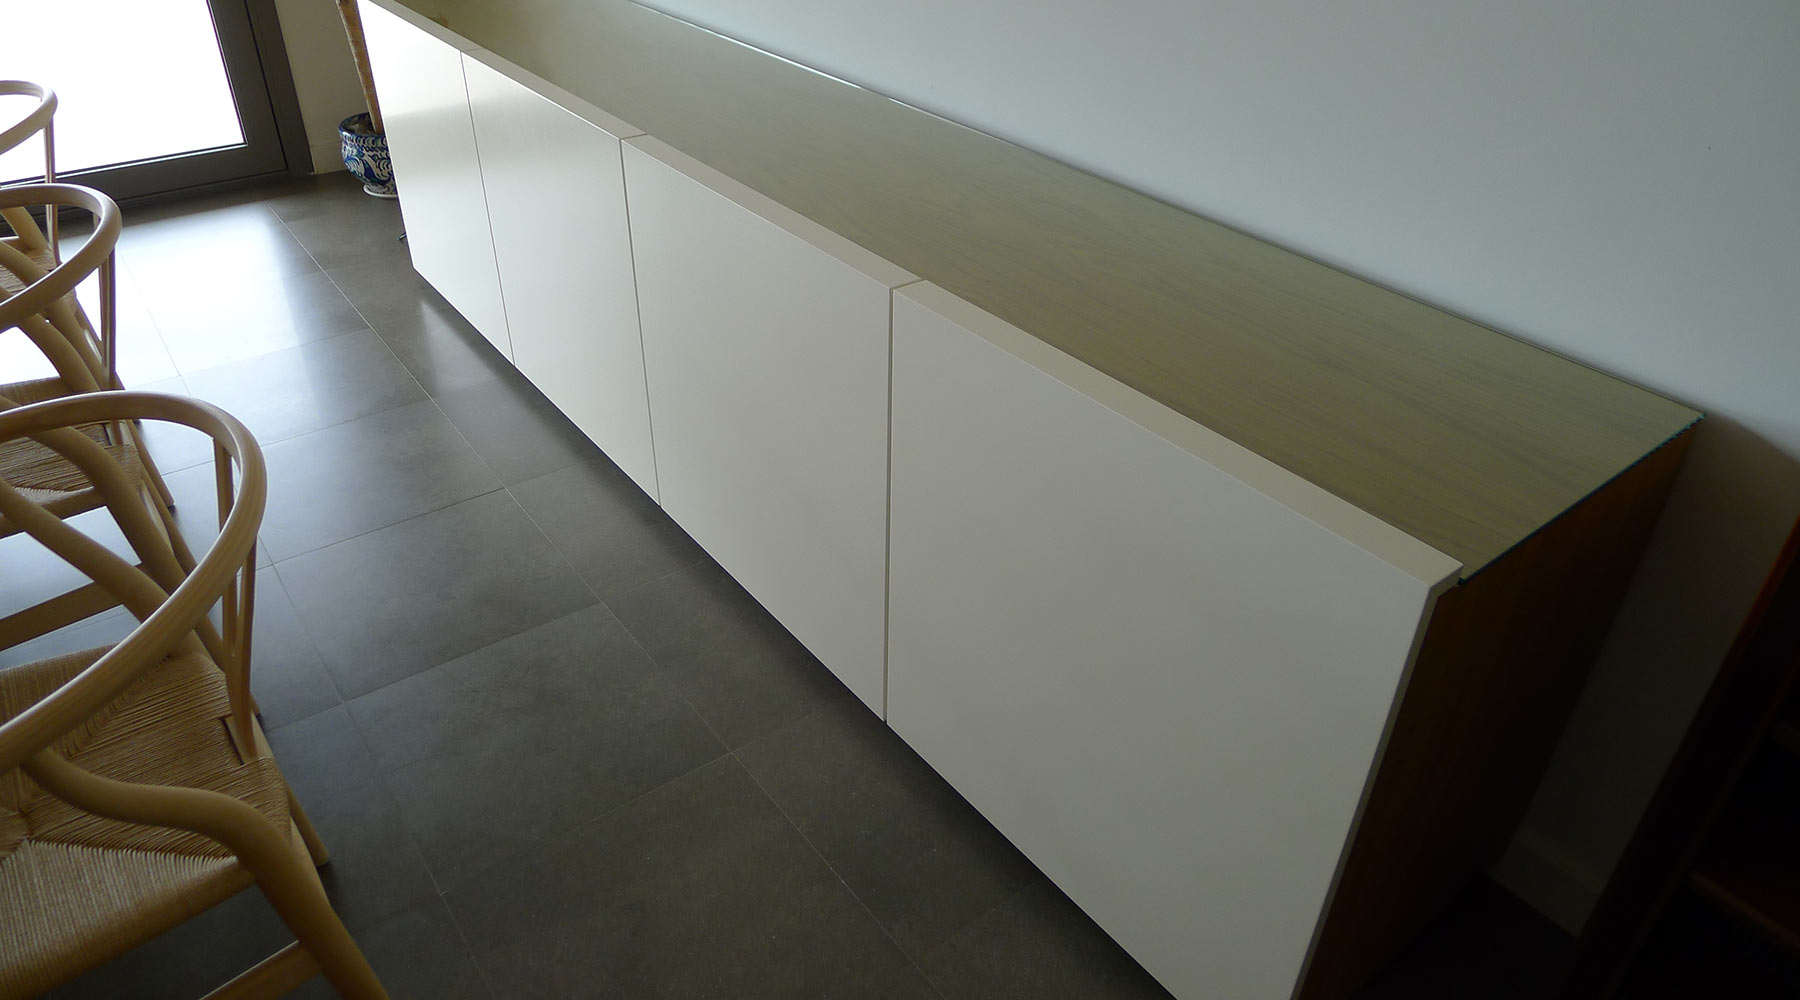 Mueble de madera a medida para salón en casa particular